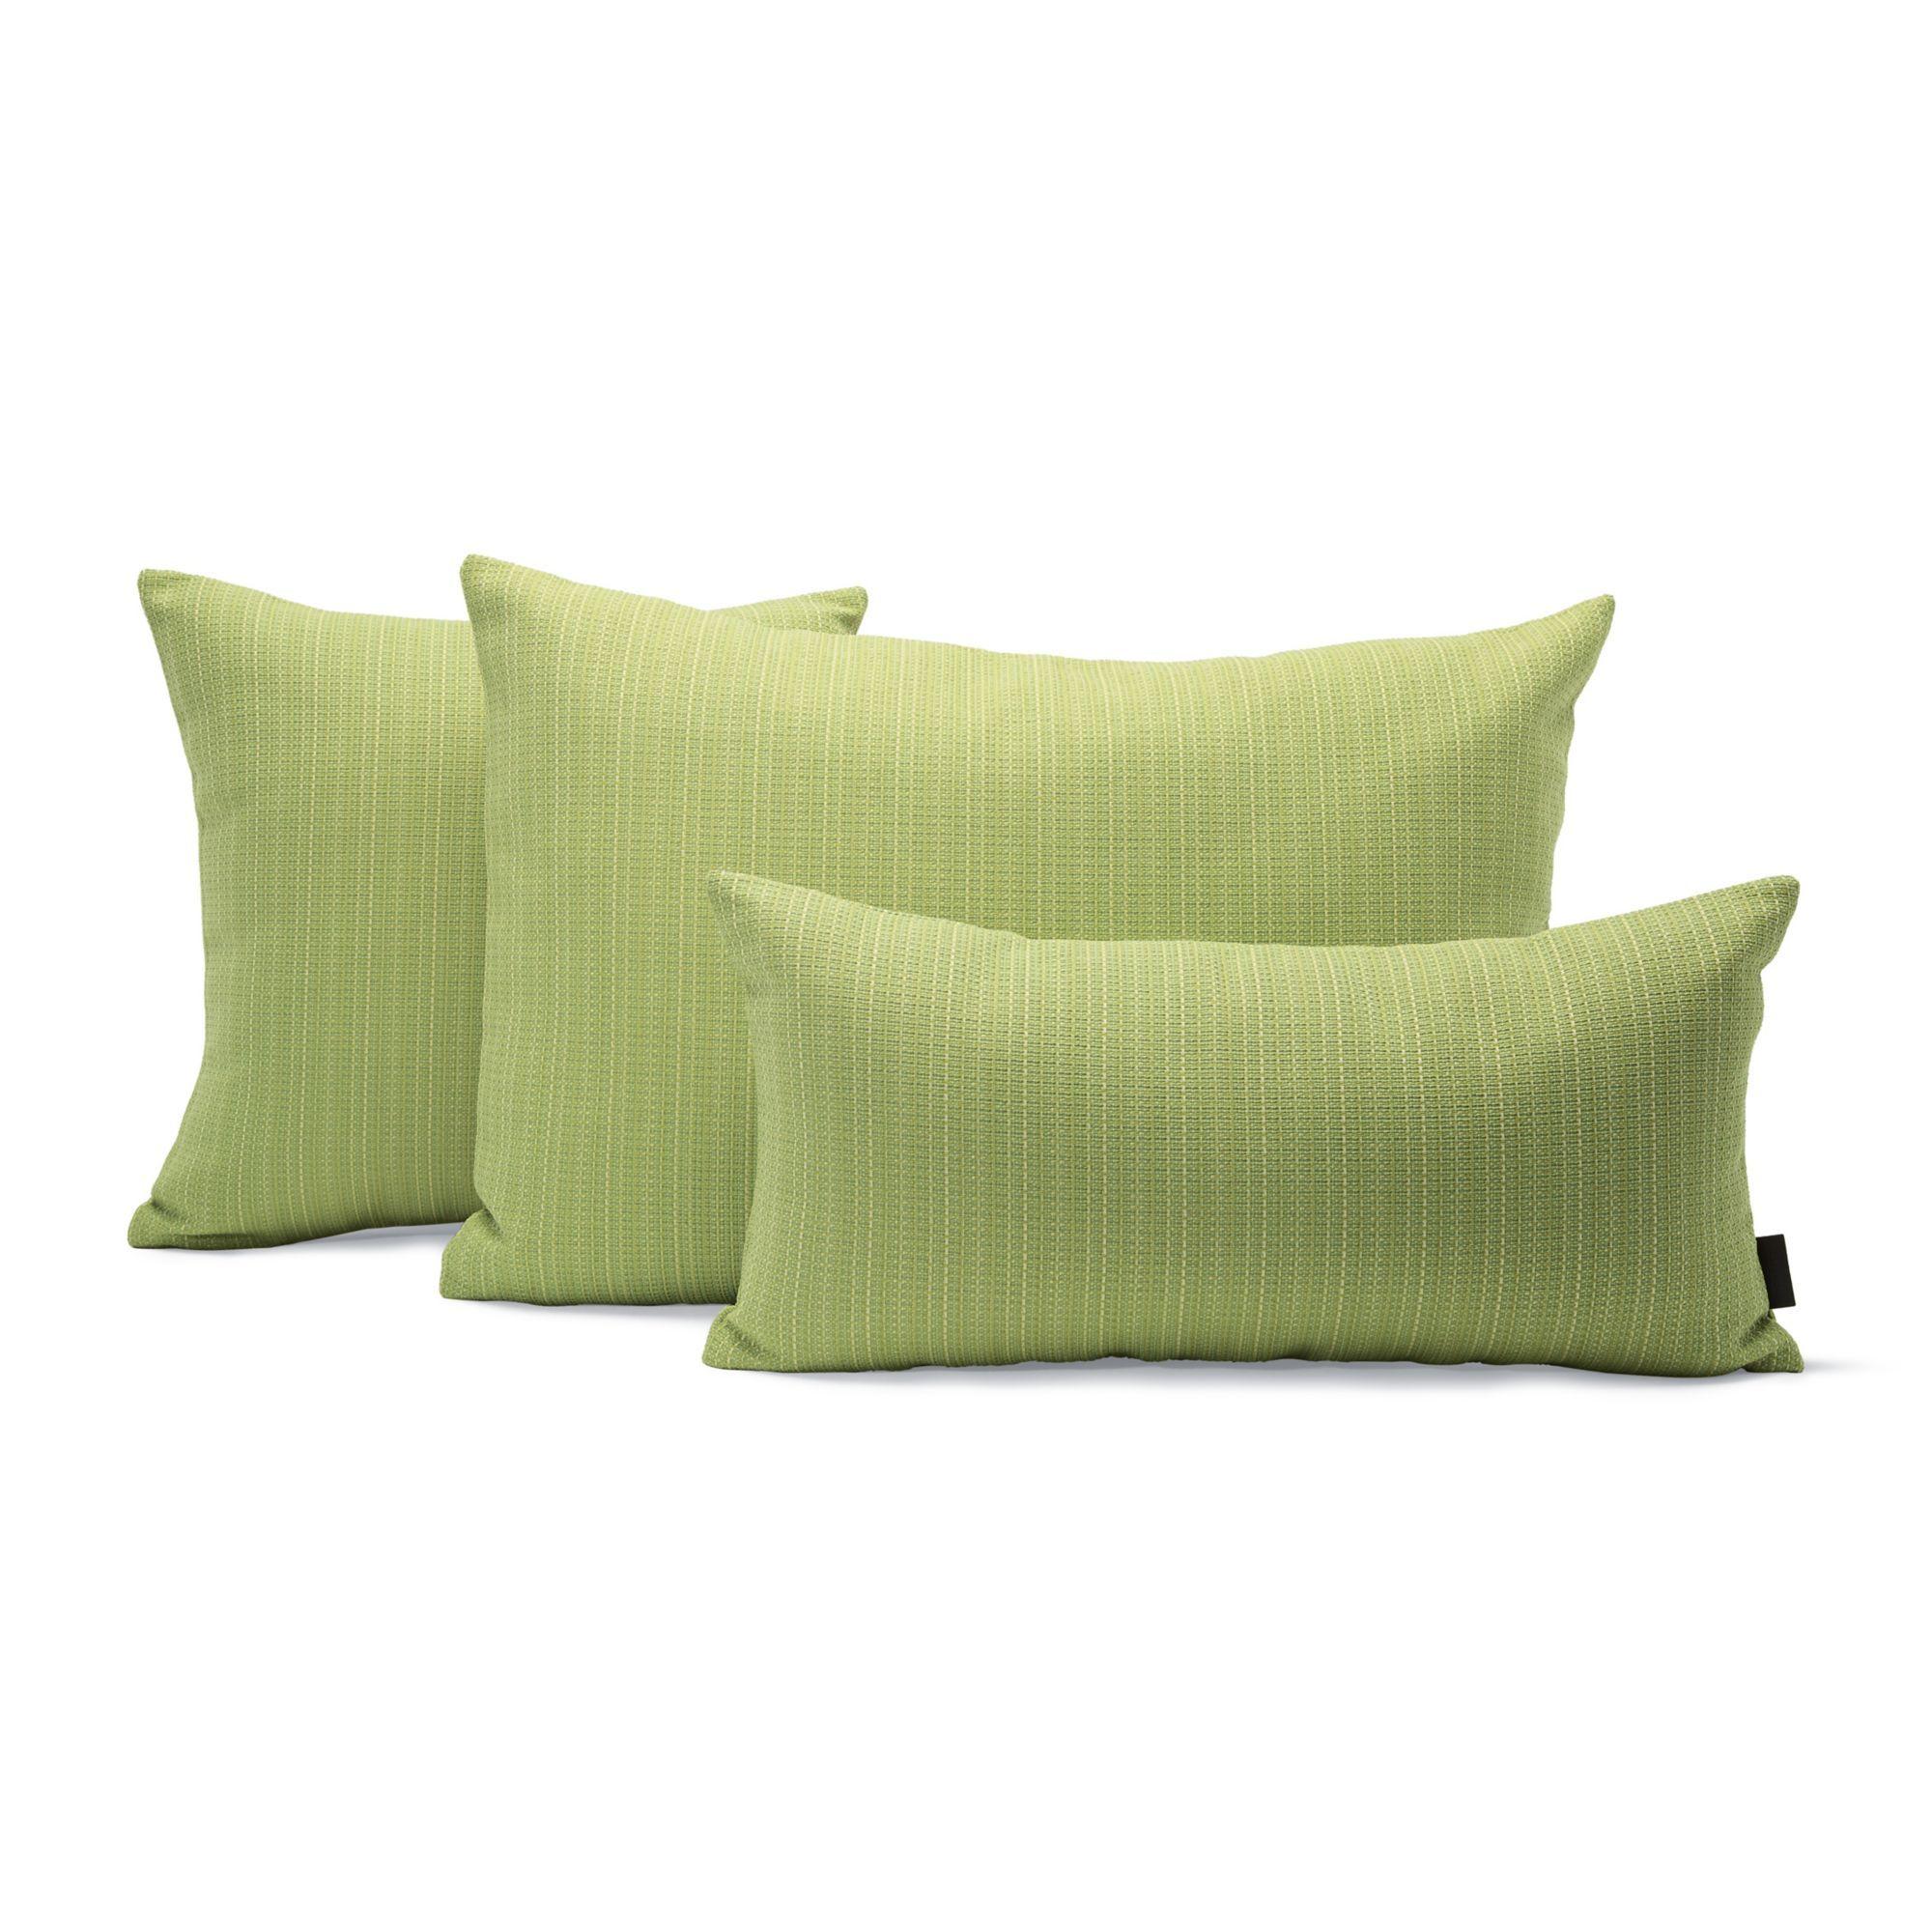 Maharam outdoor pillow in chalet